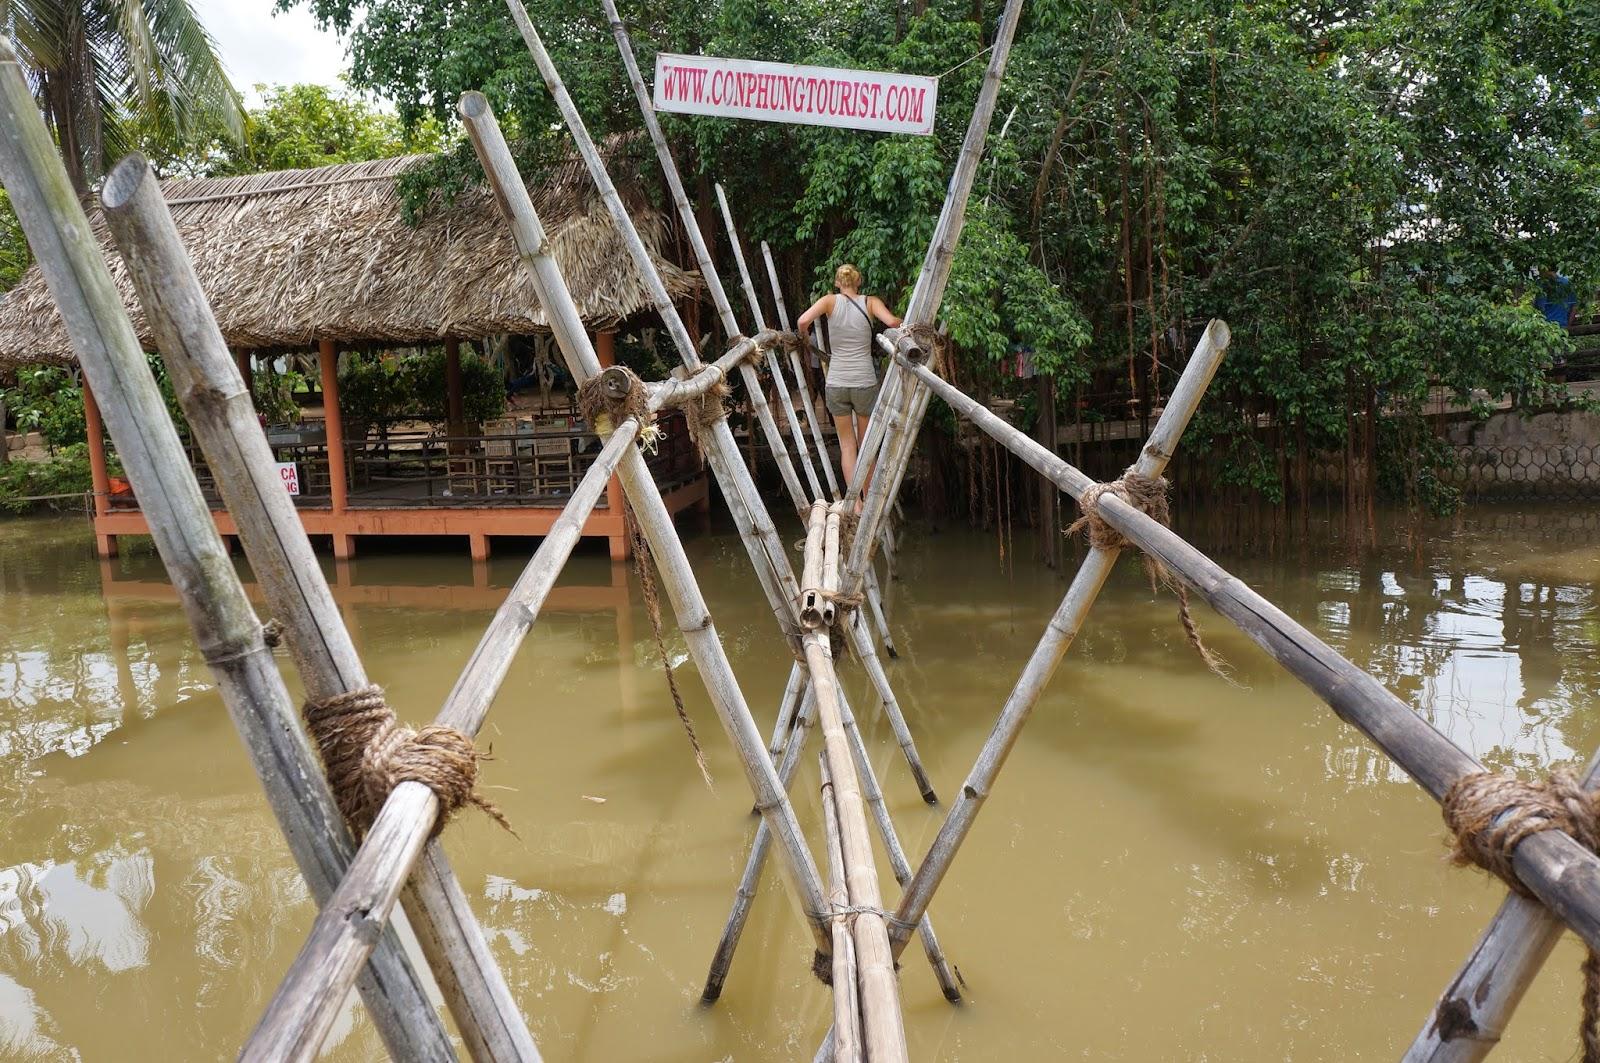 Crossing this rickety bamboo bridge